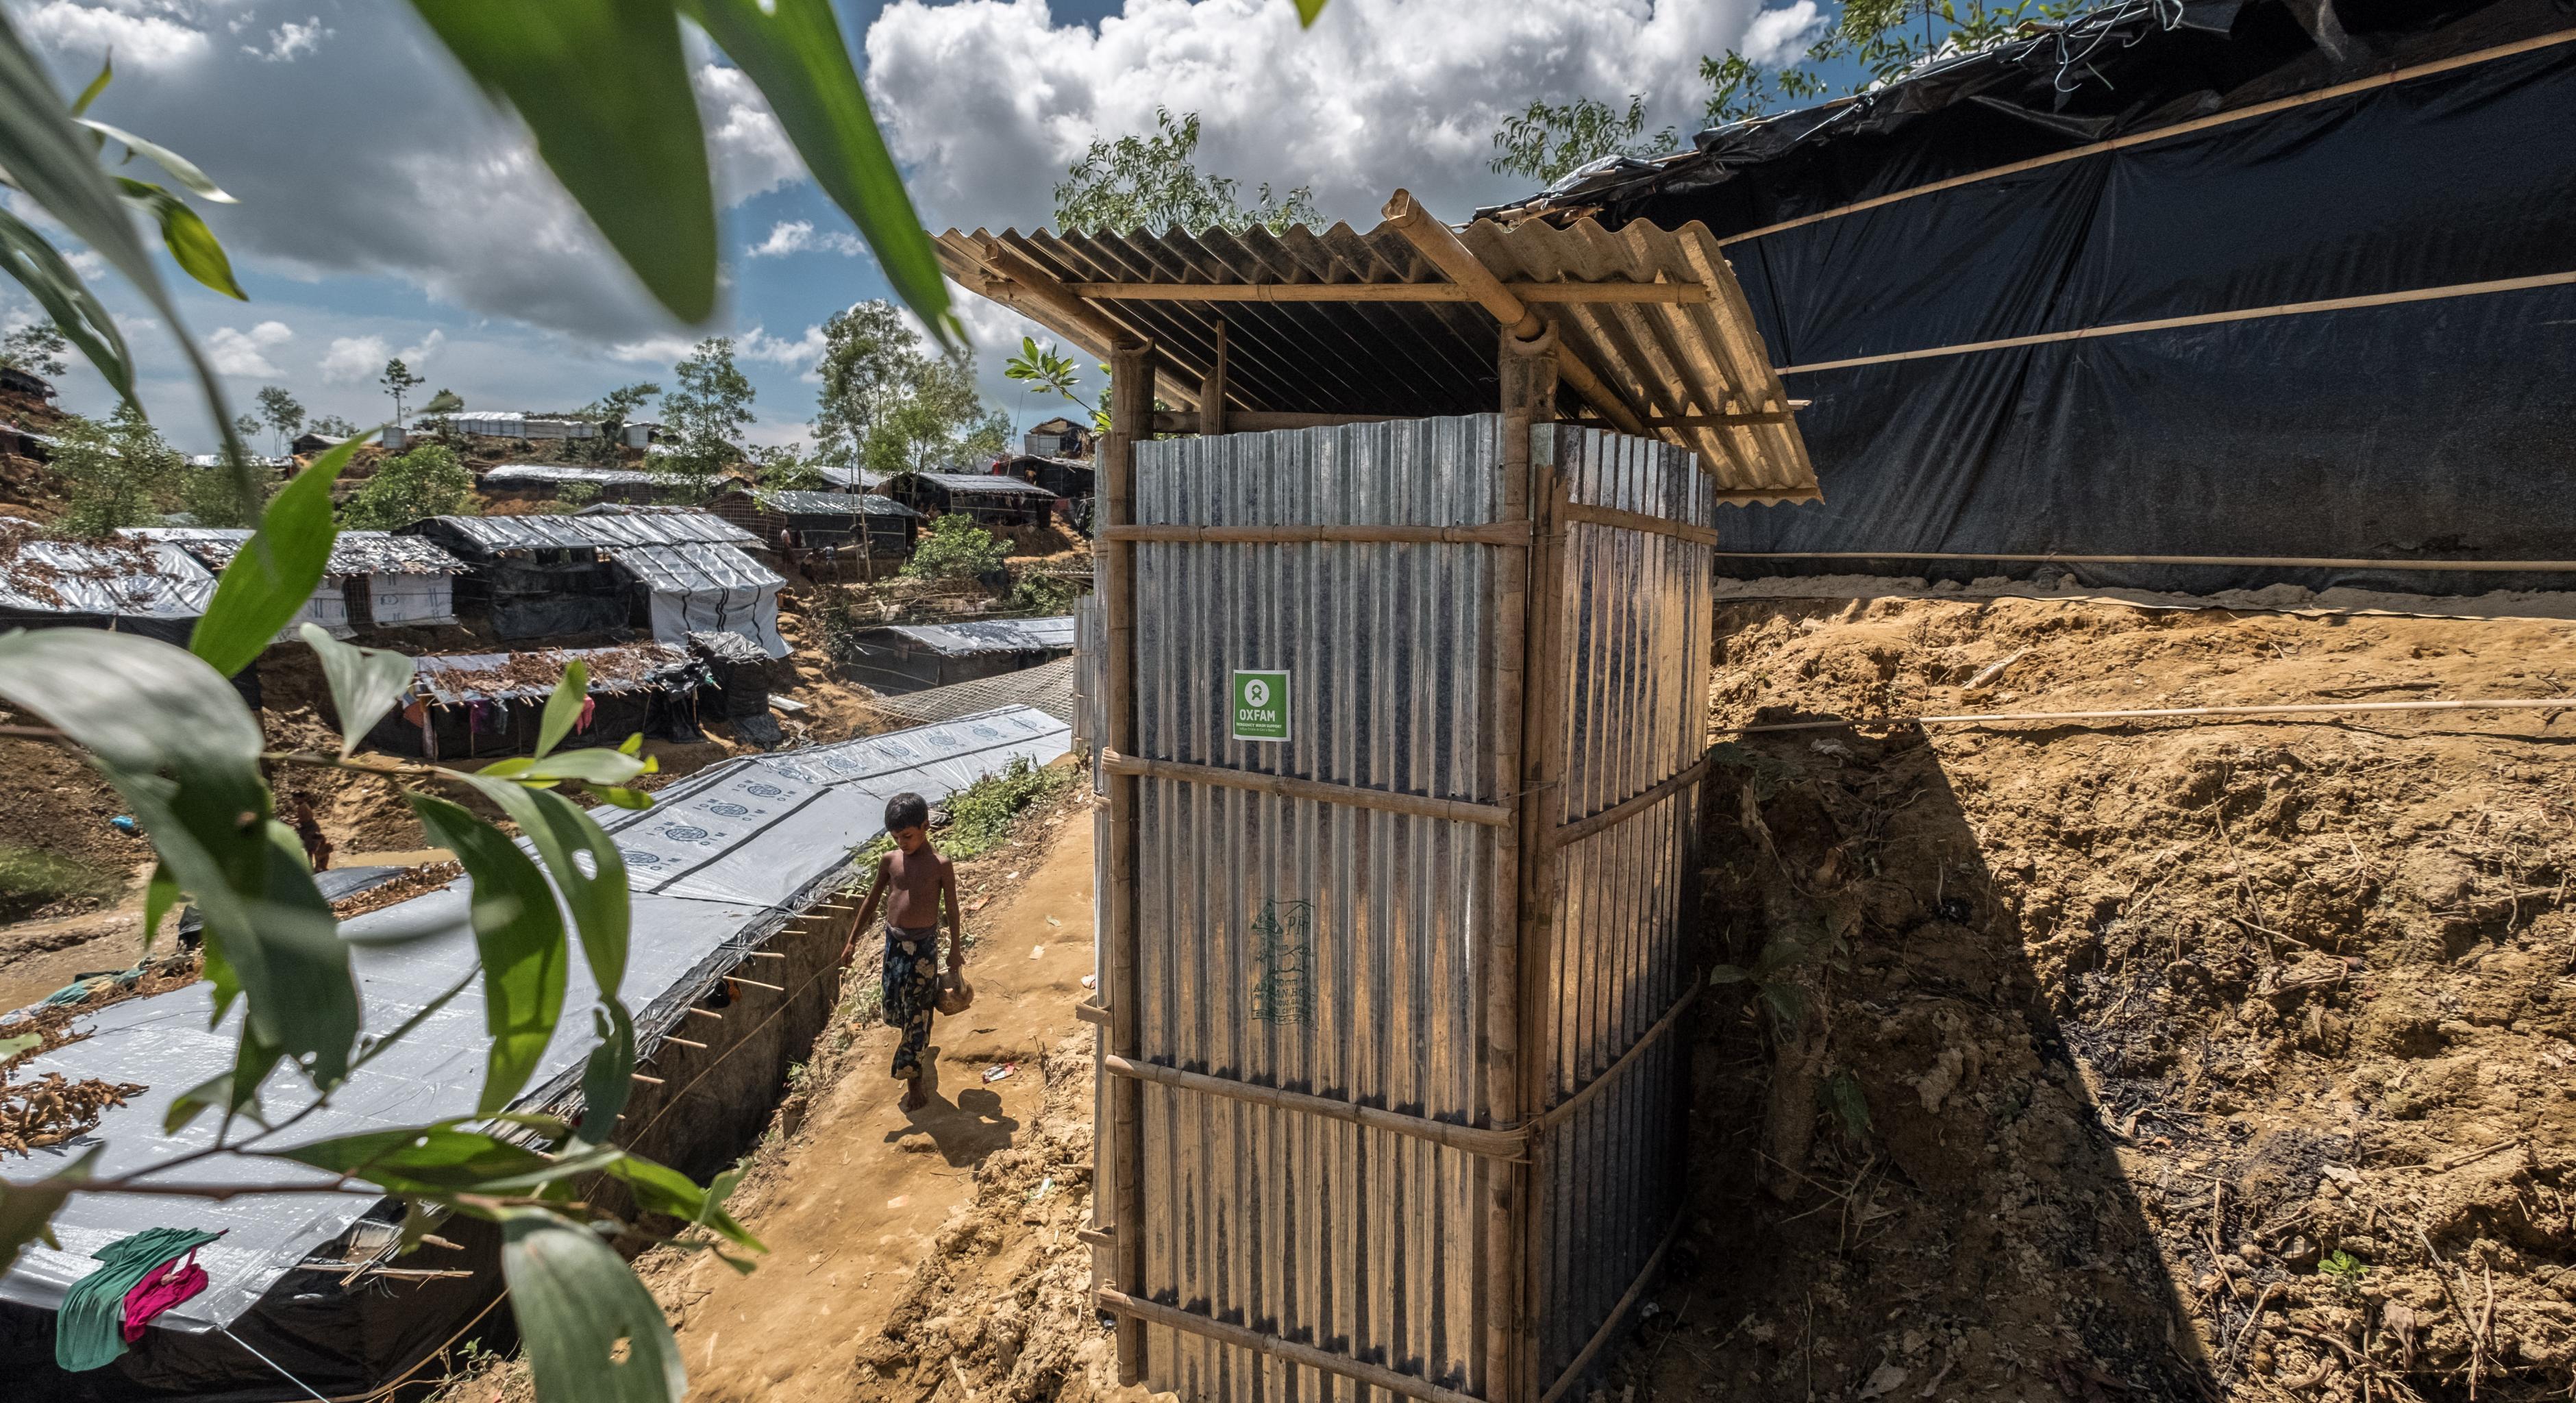 Oxfam-Latrine im Balukhali-Camp in Bangladesch